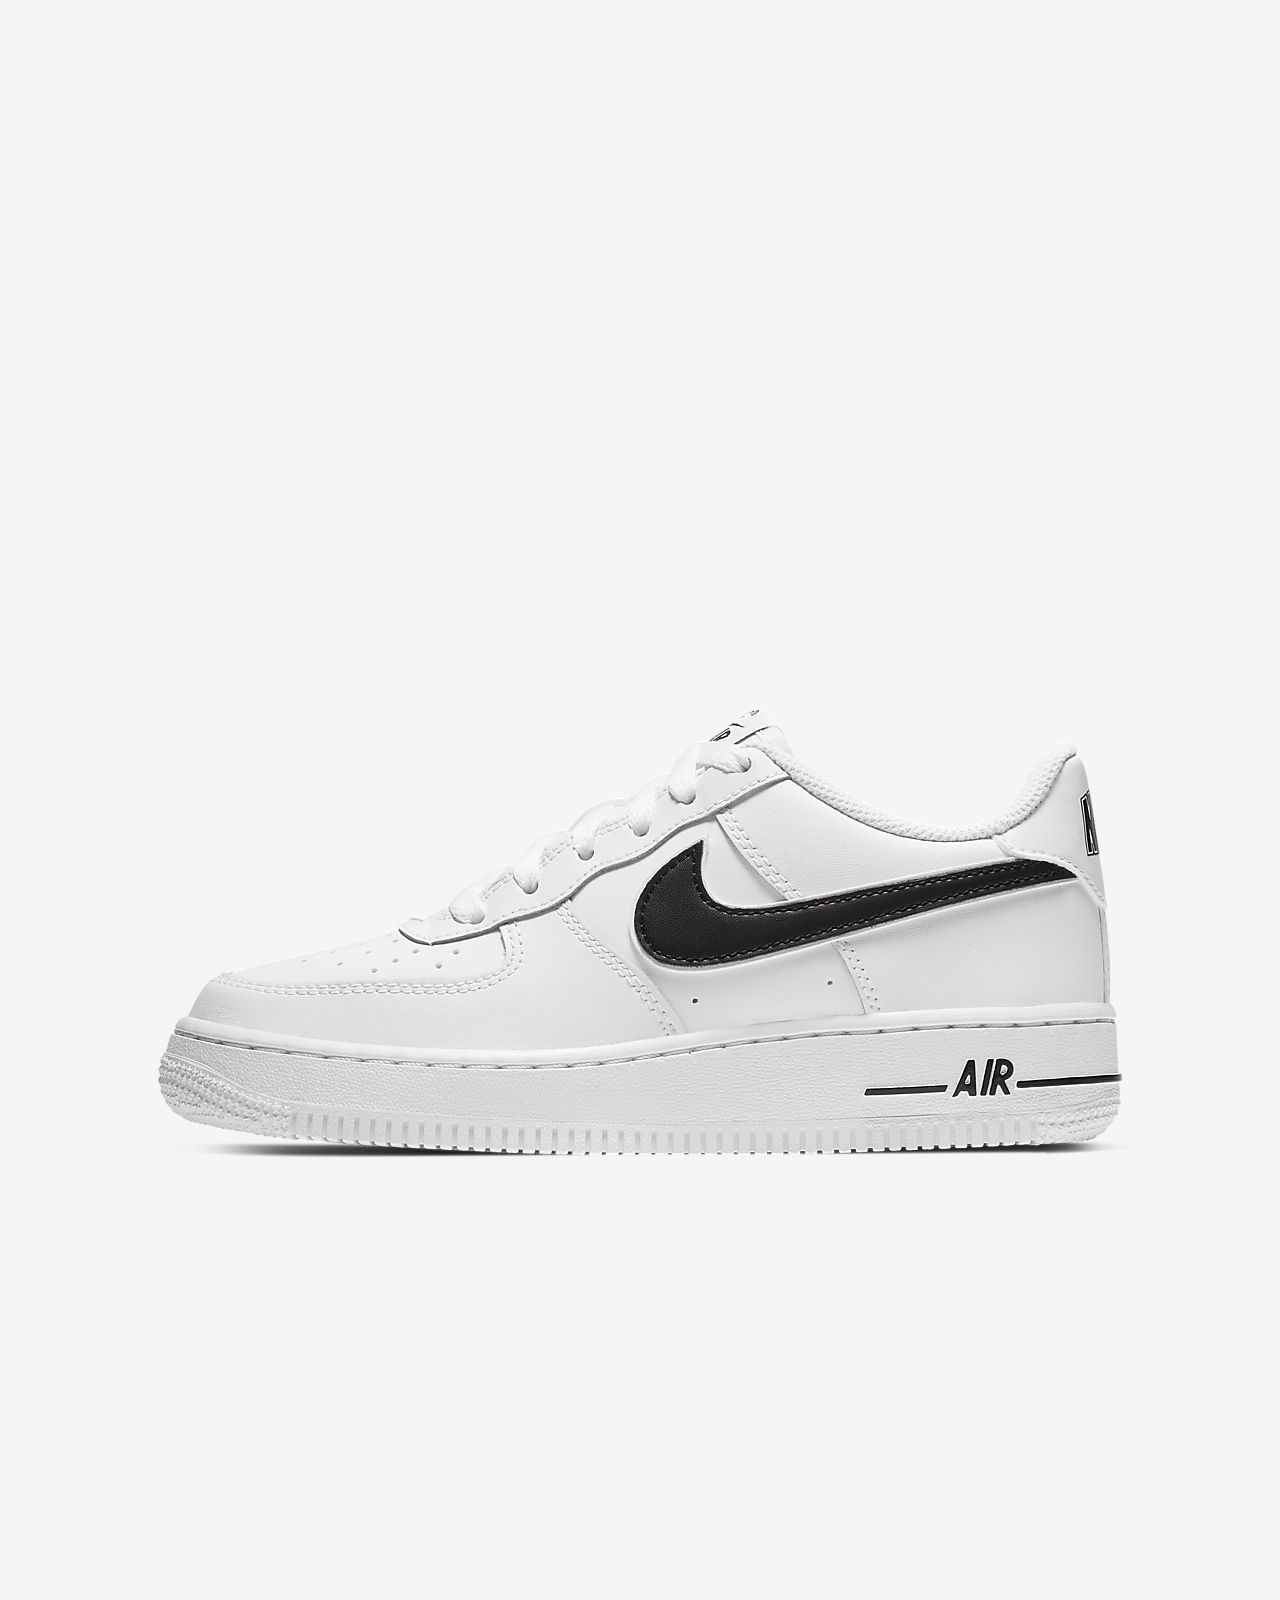 Nike Air Force 1 3 Schuh für ältere Kinder